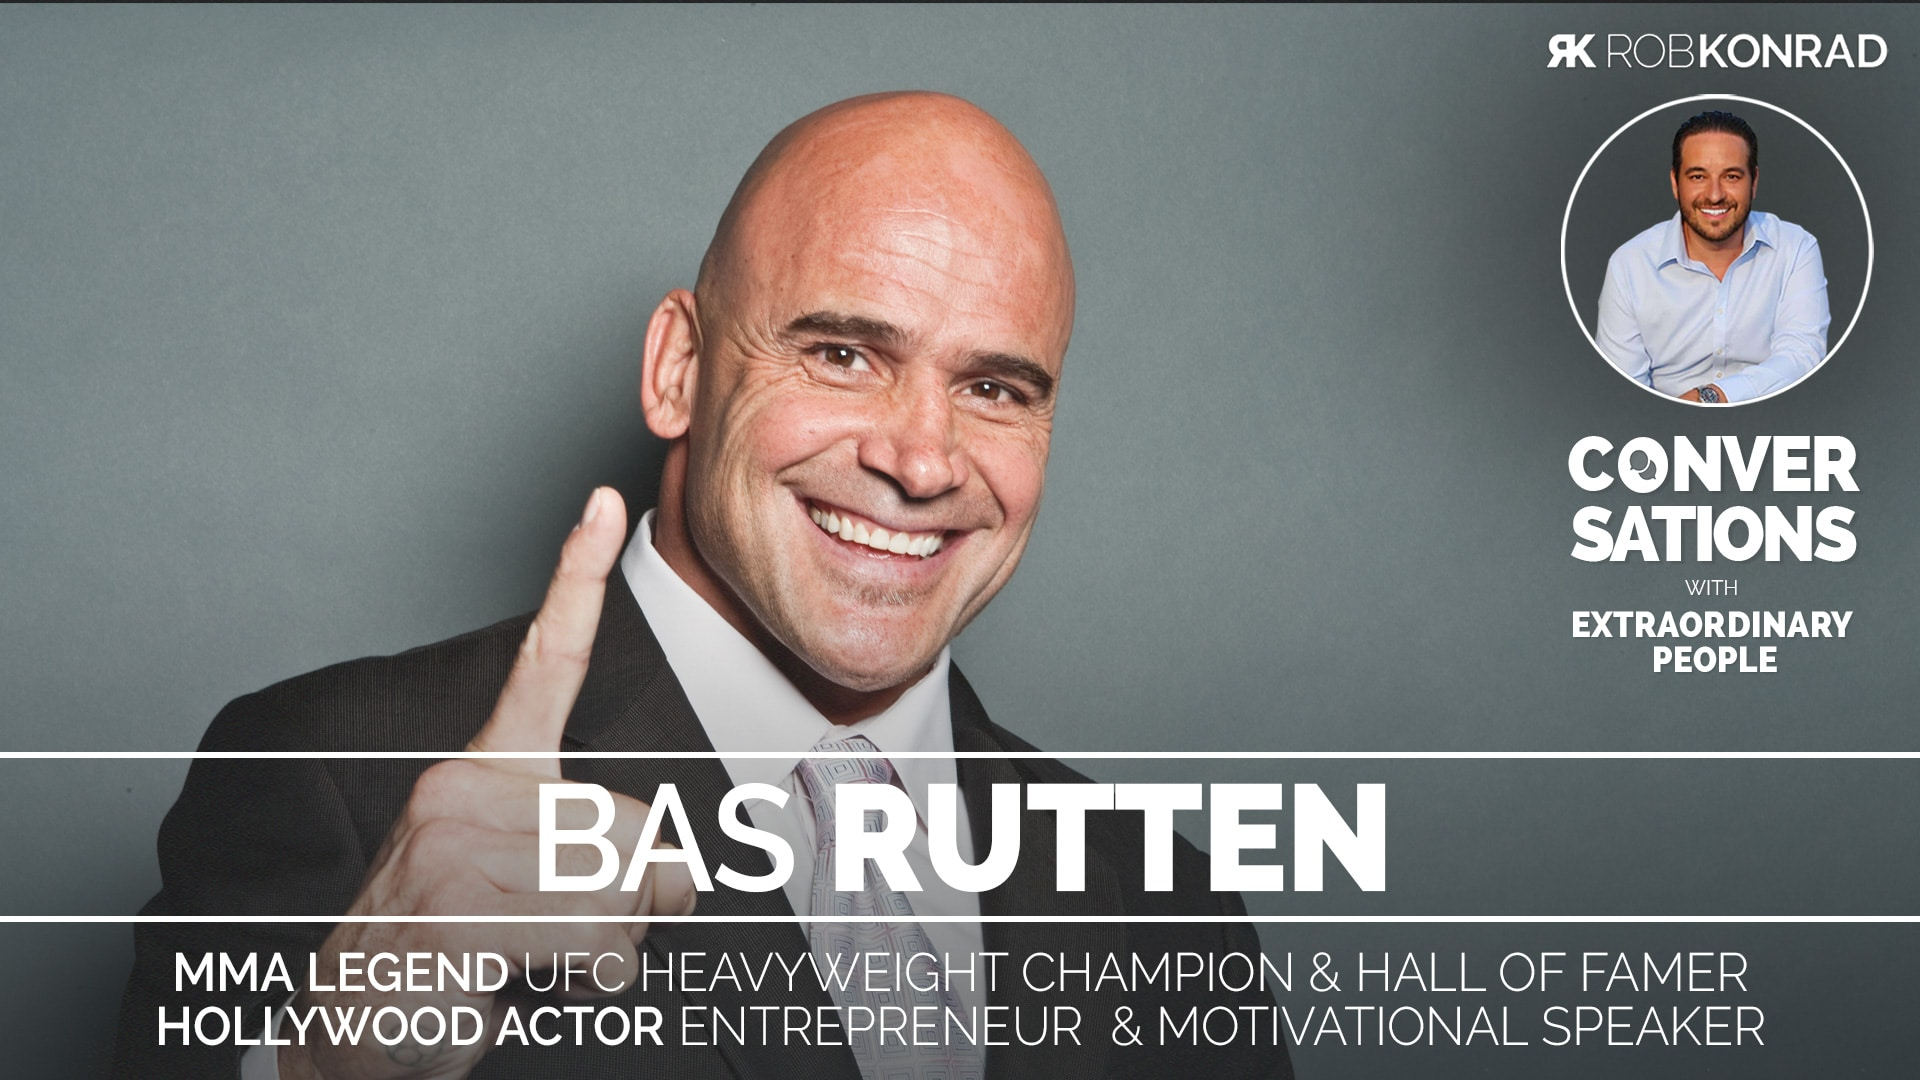 0004-Bas-Ruten--Rob-Konrad-Conversations-WIDE